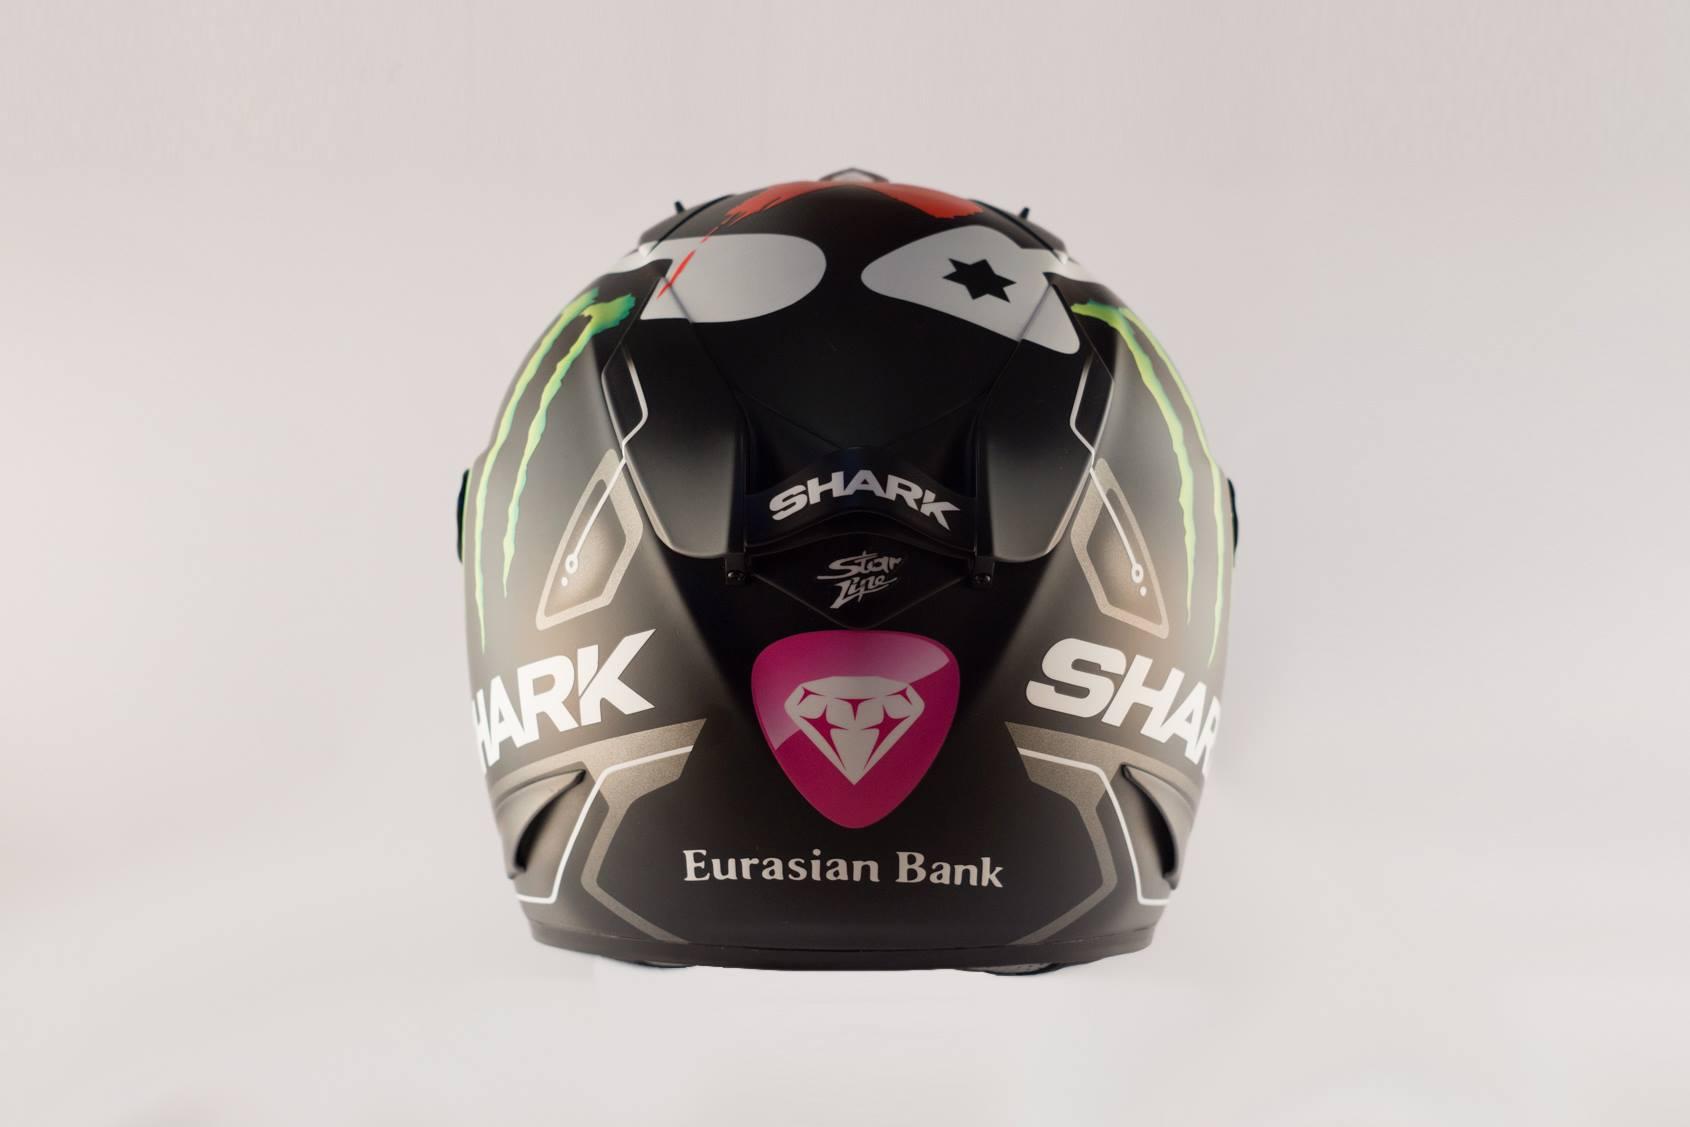 Jorge Lorenzo Shows His New Shark Helmet, Looks Rather Dull ...